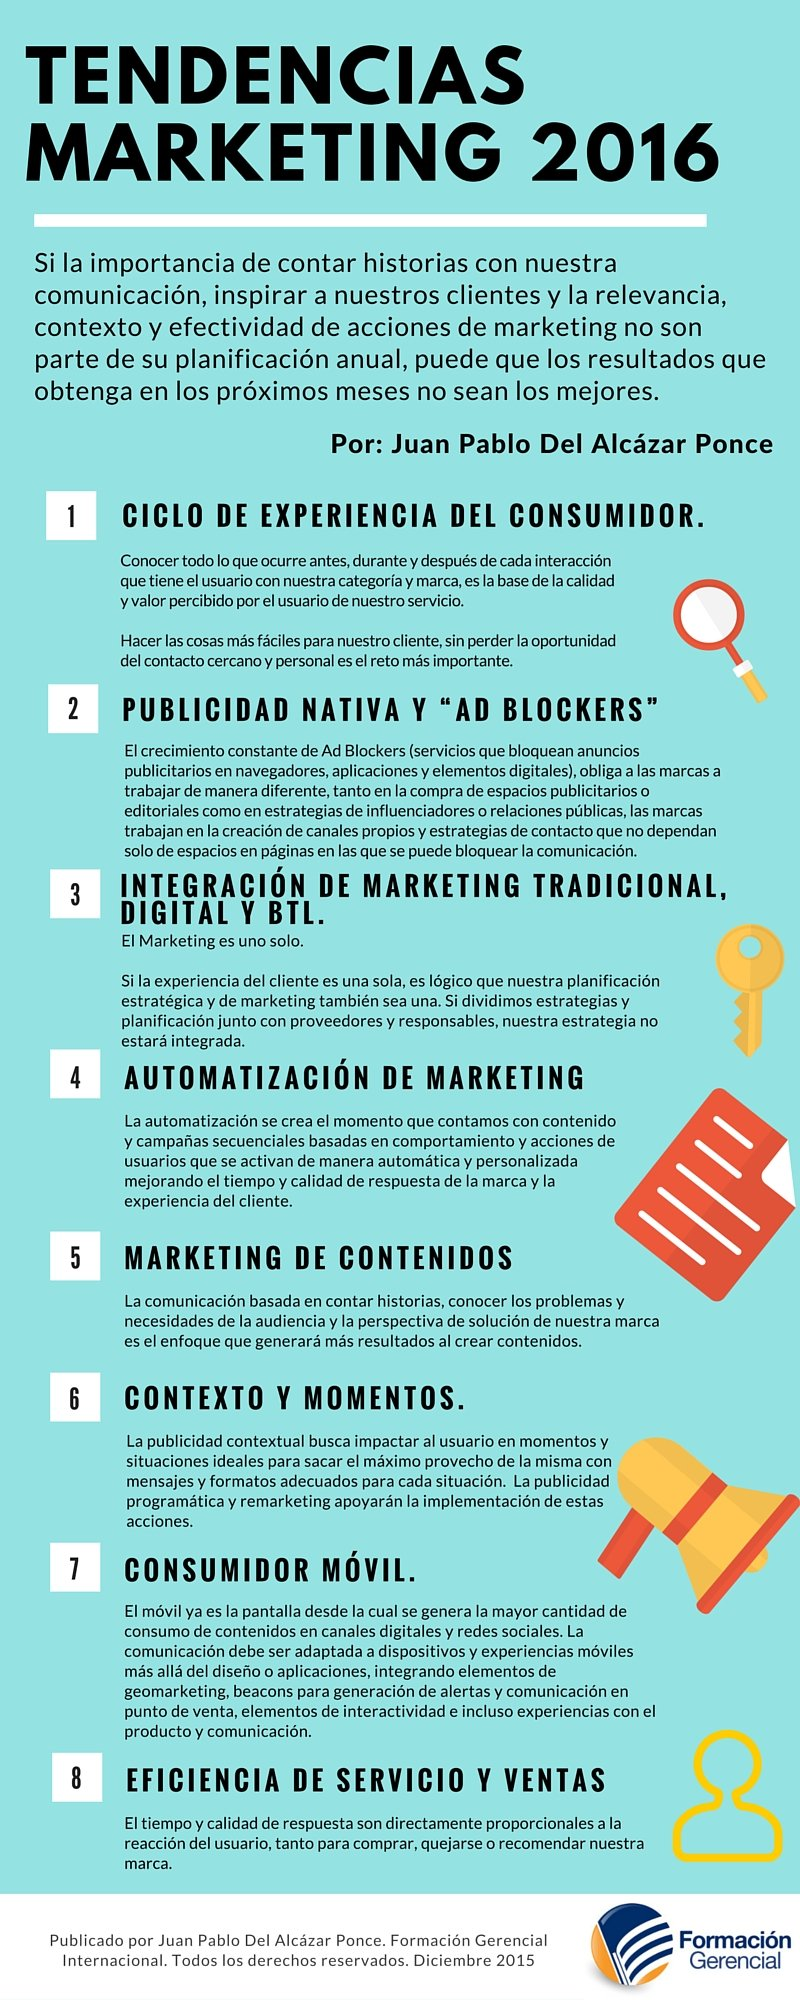 Infografía tendencias de marketing 2016